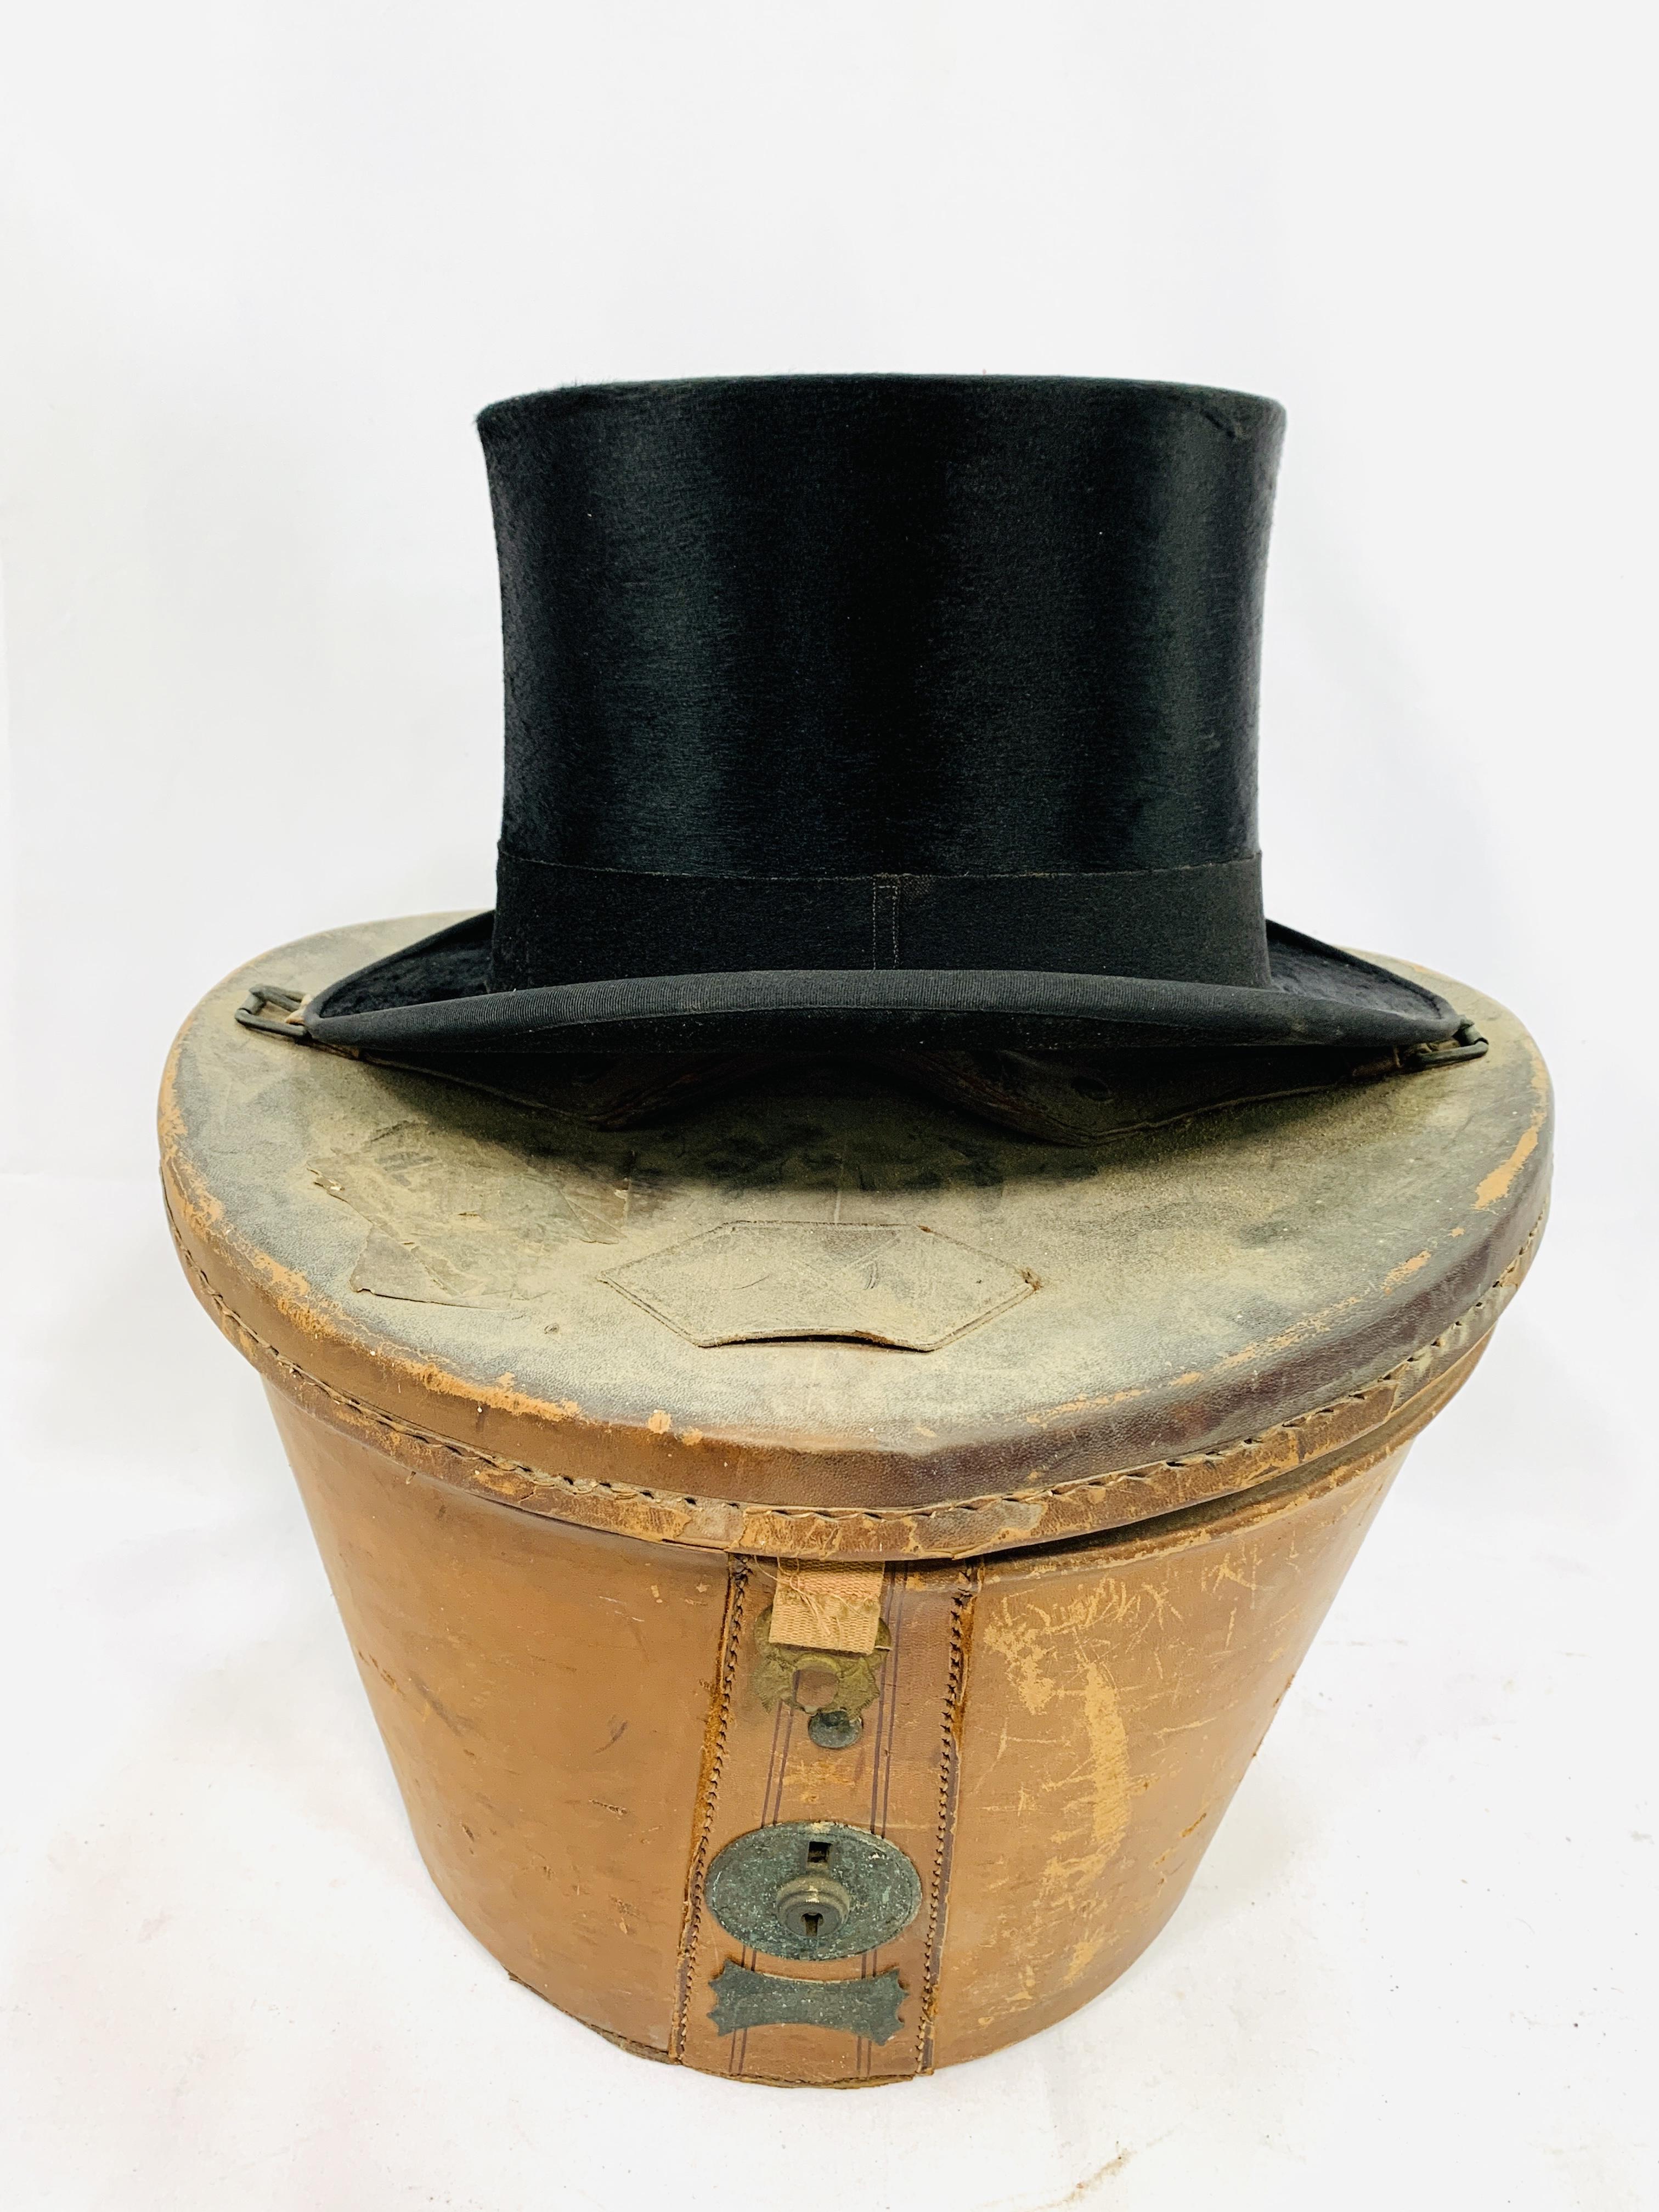 Black silk top hat by City Cork Hat Company Ltd